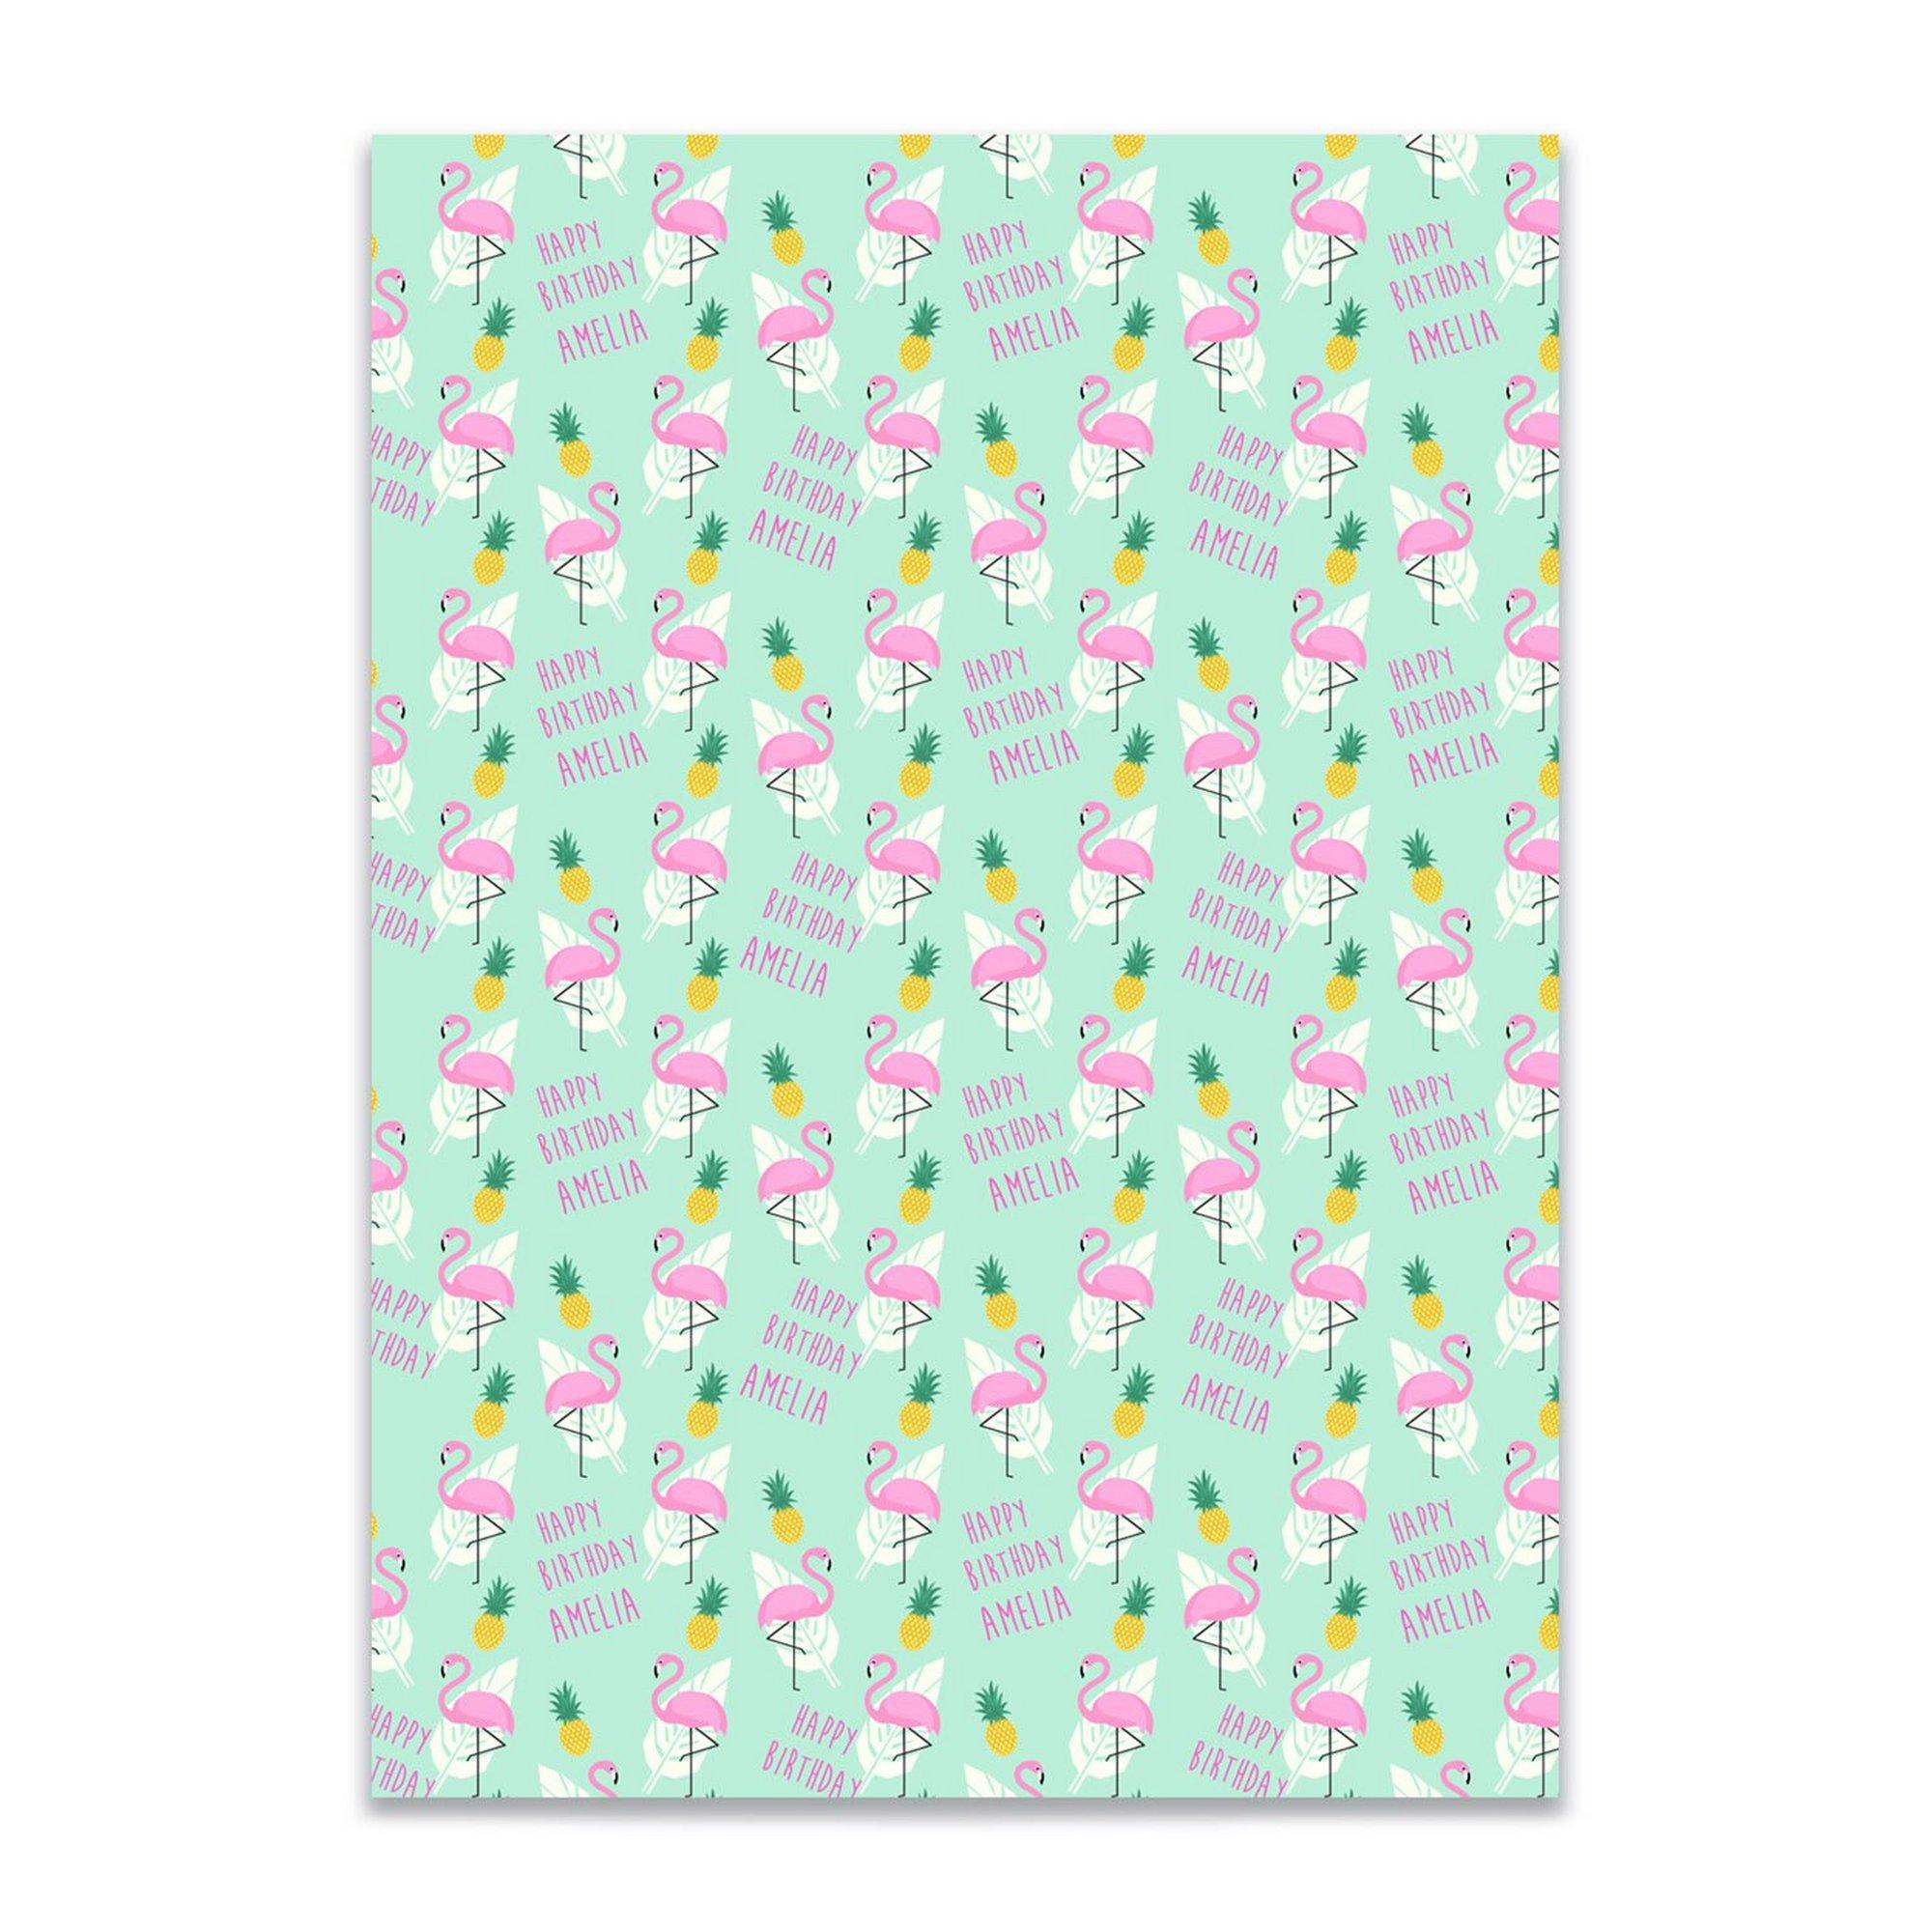 Image of Personalised Flamingo and Pinapple Gift Wrap